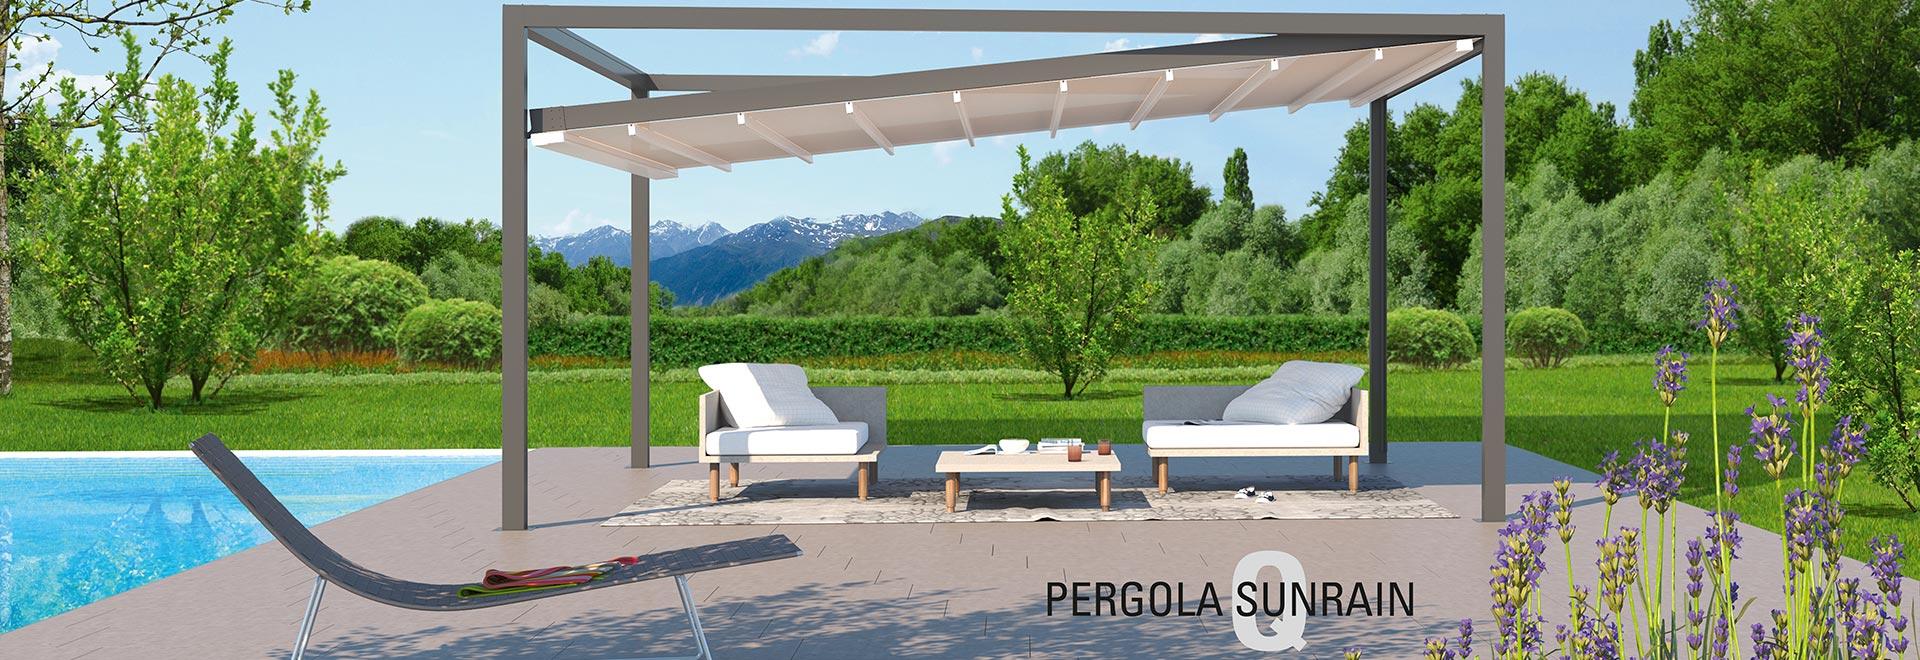 Terrassenüberdachung Pergola Sunrain Q